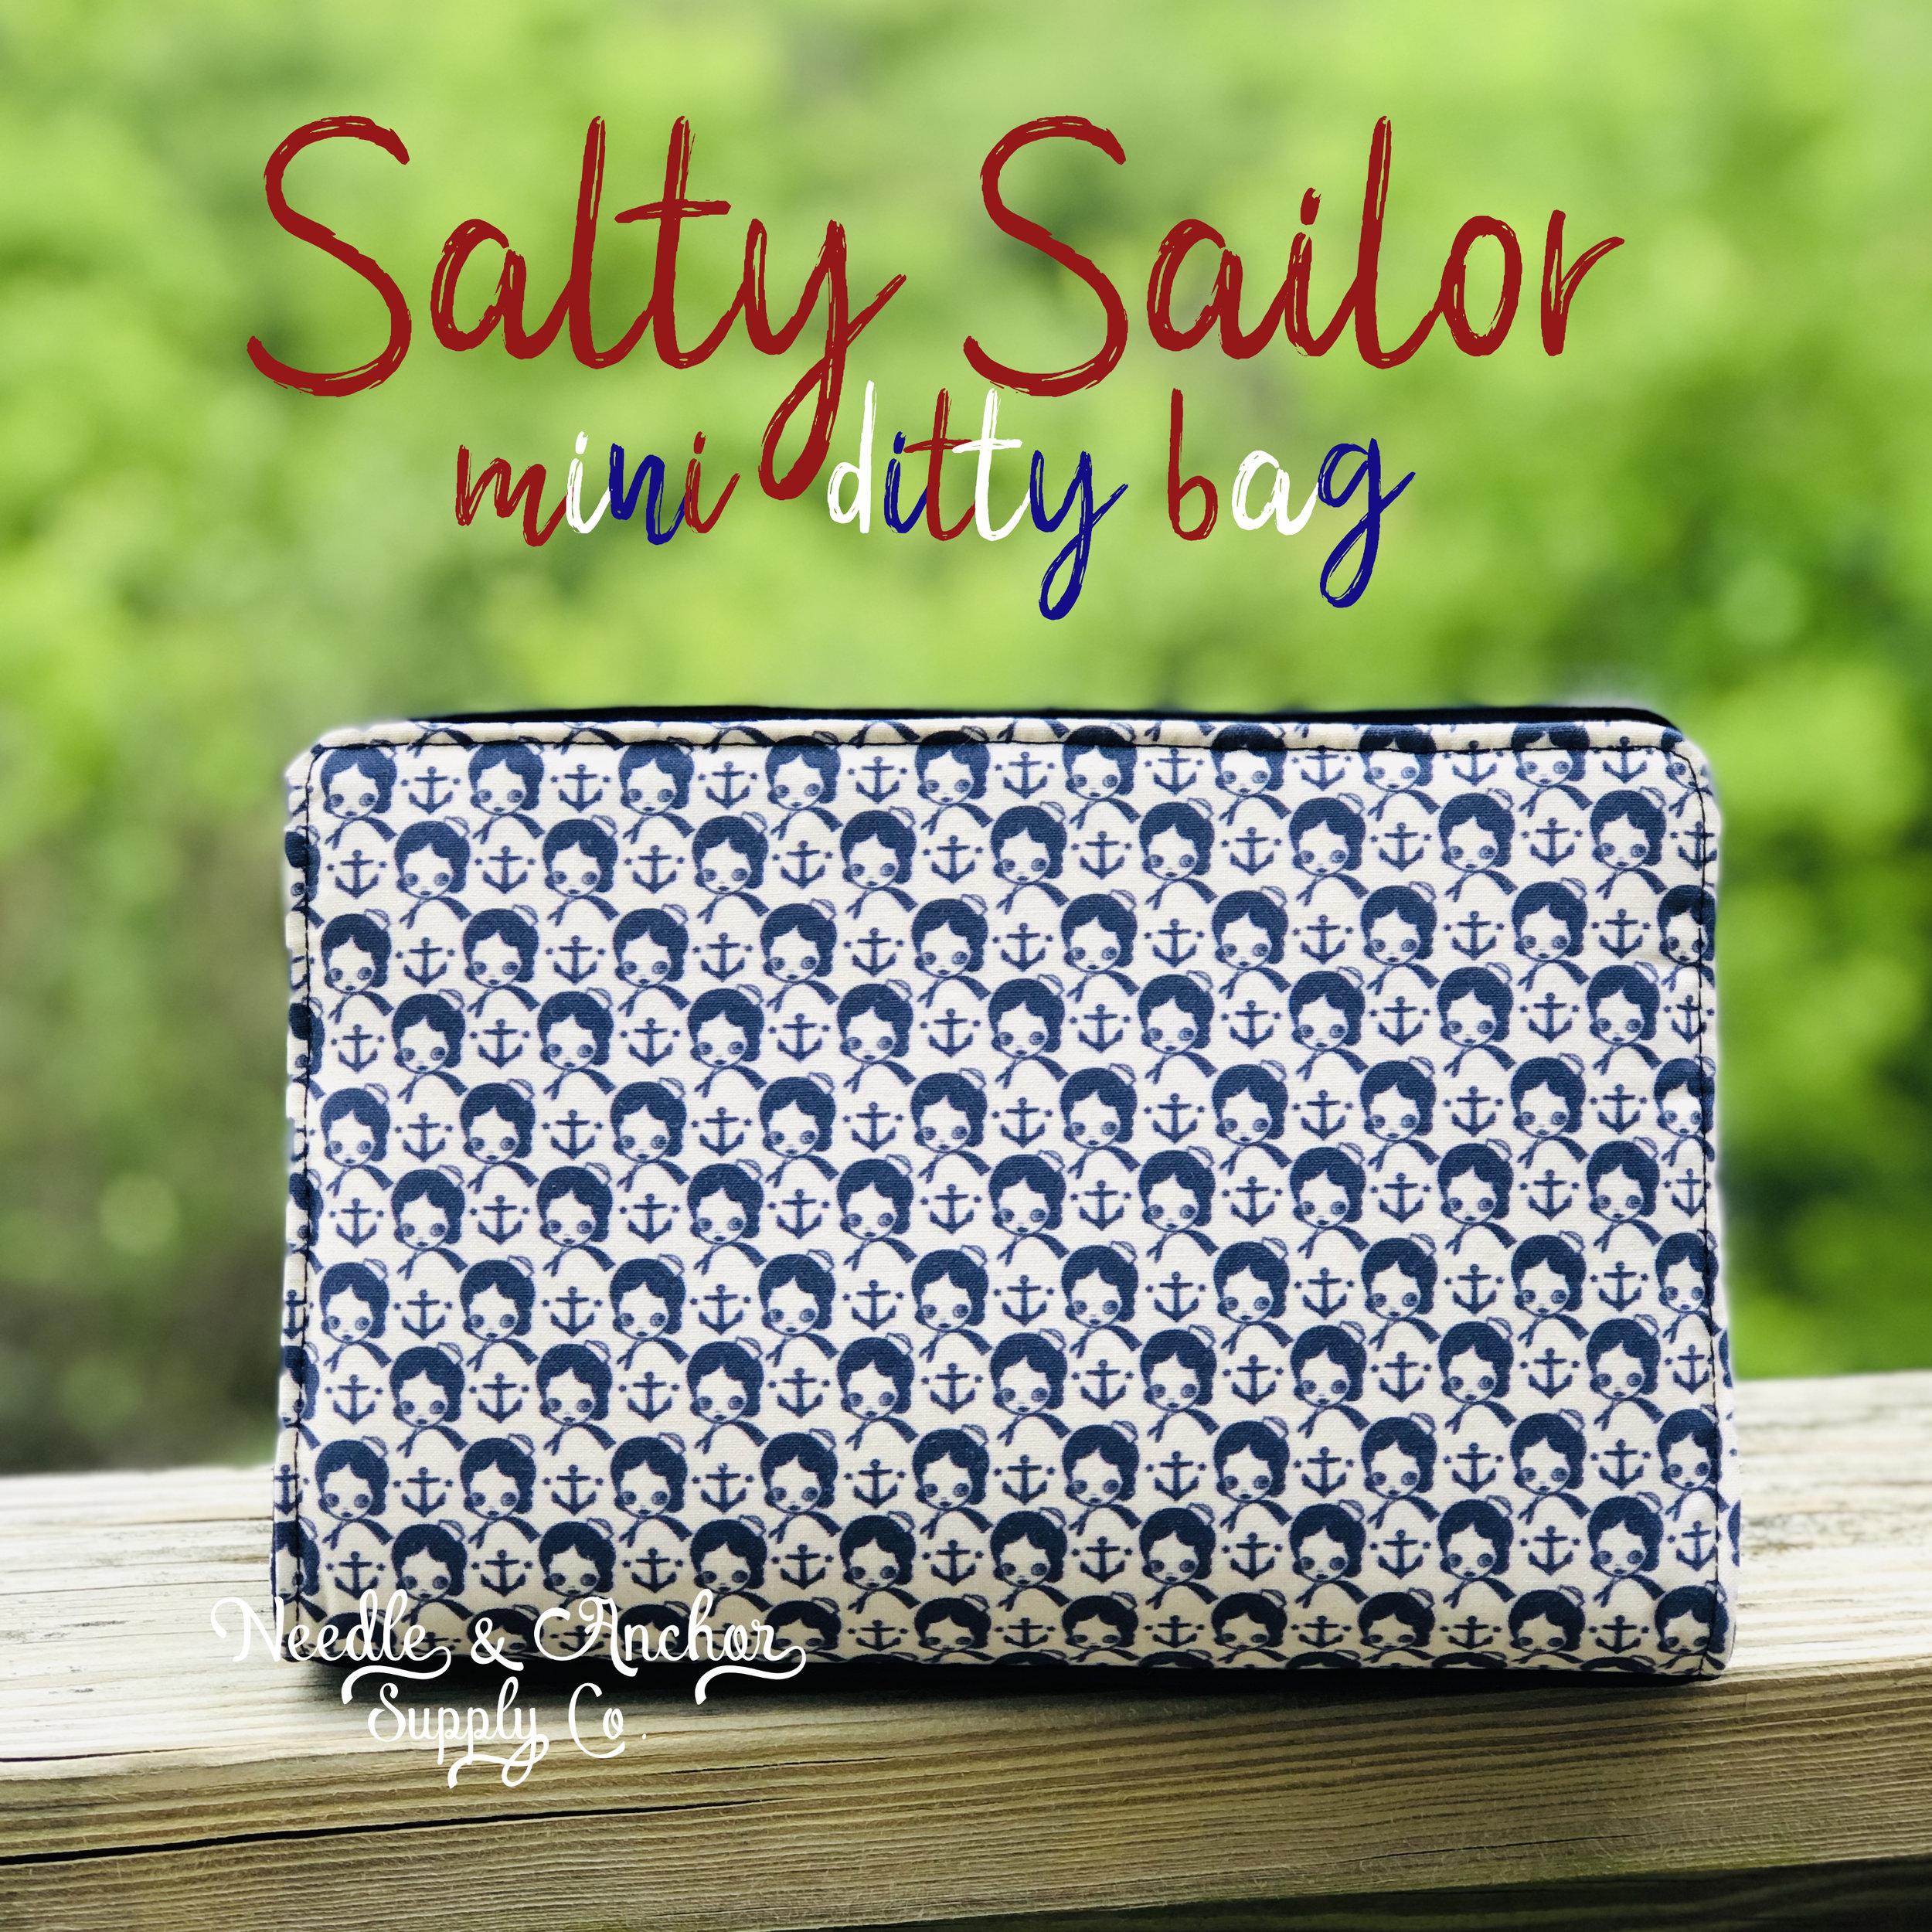 SailorGirl.jpg